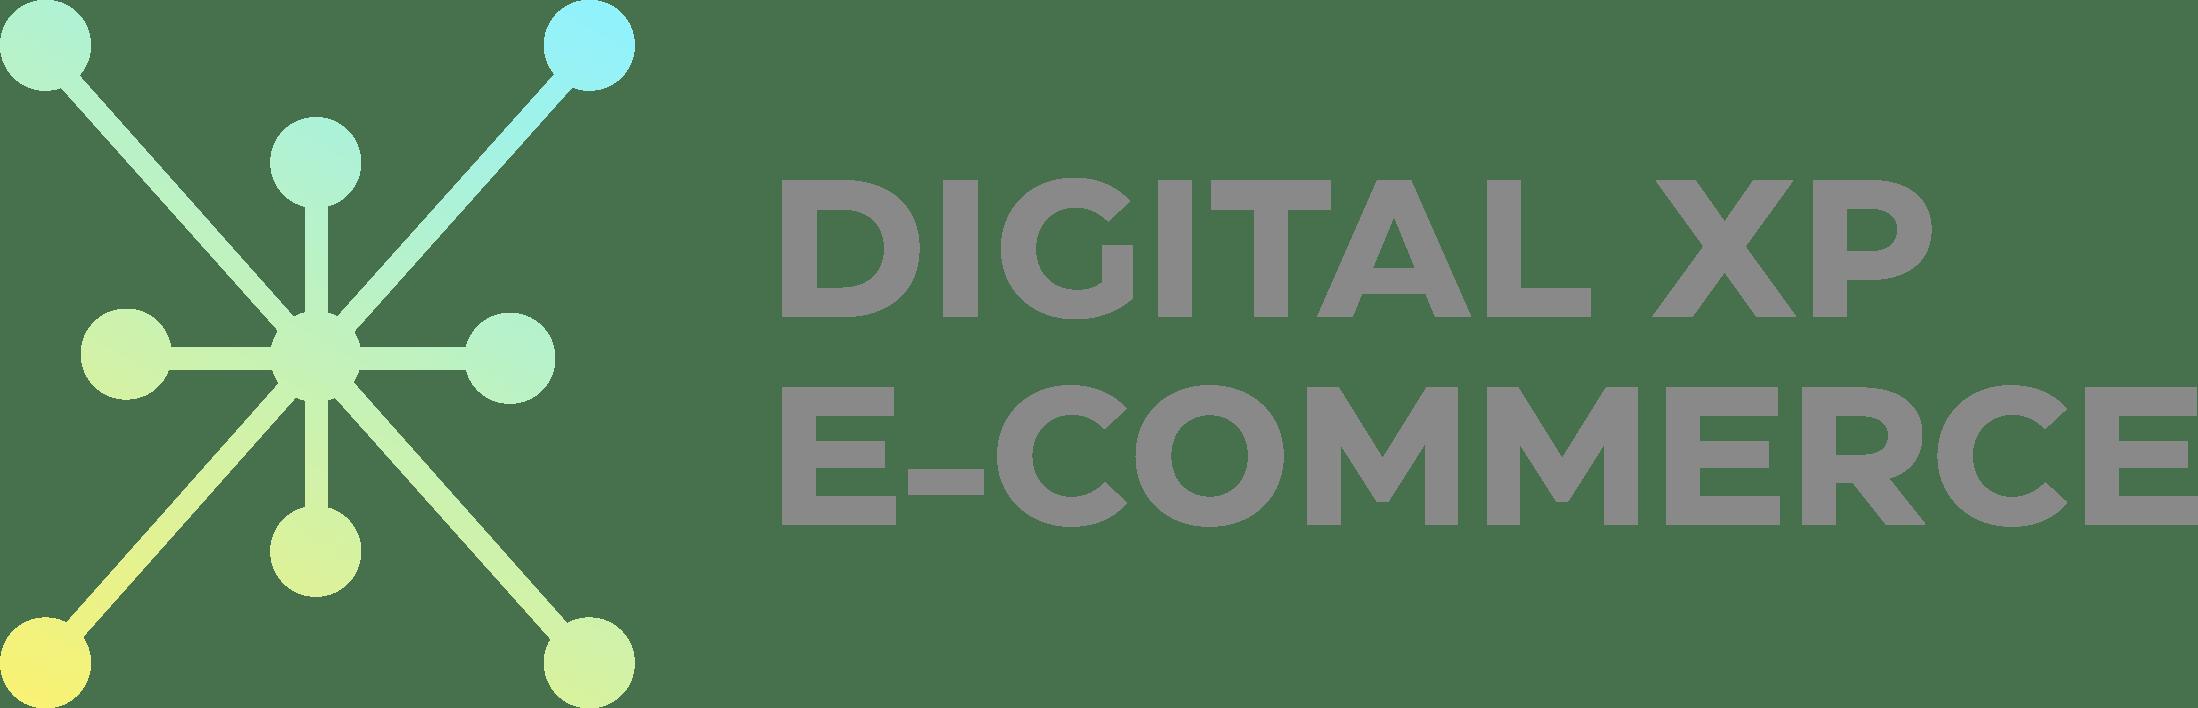 Digital Xp E-commerce